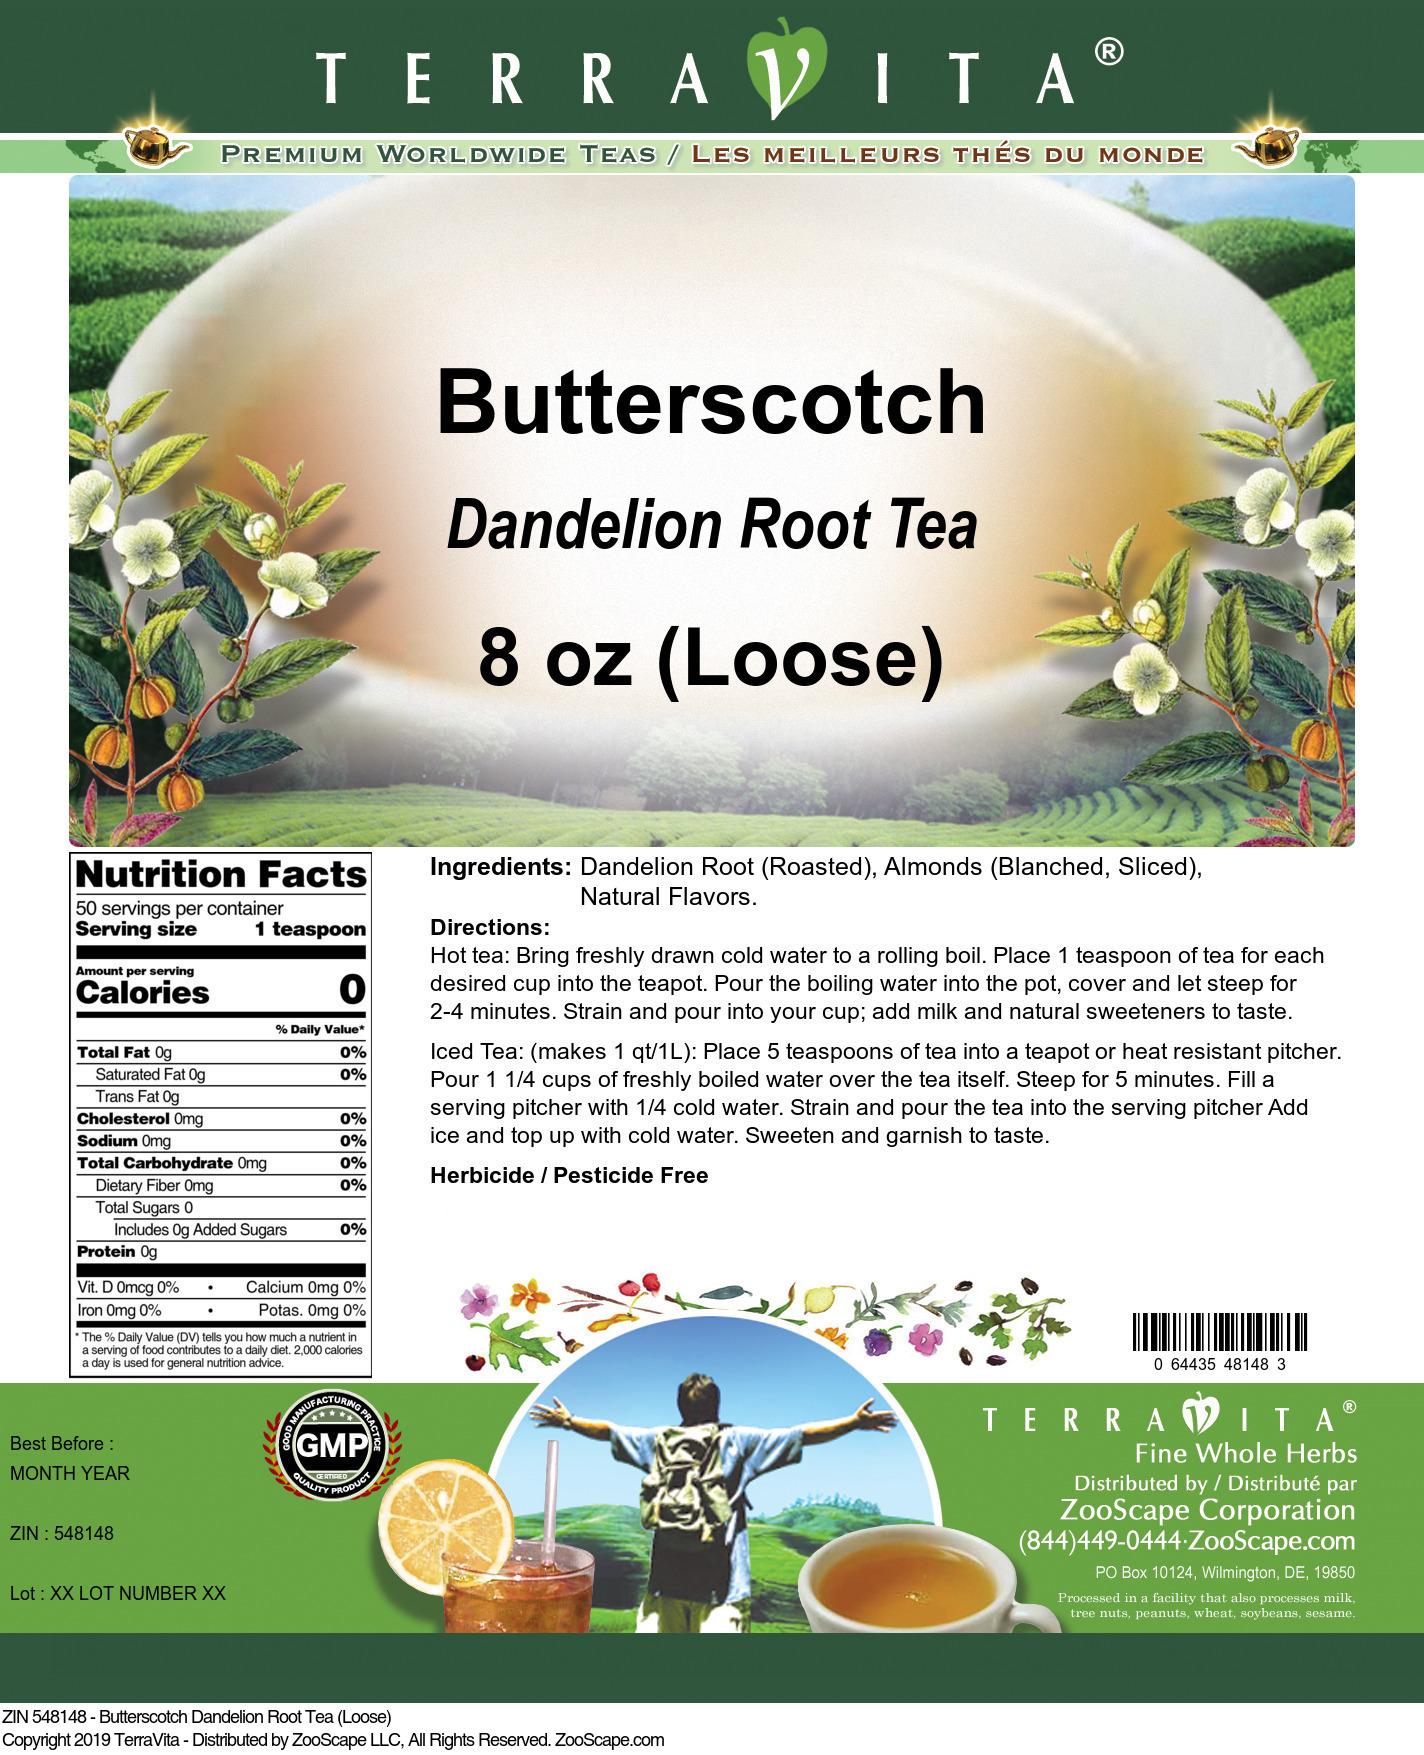 Butterscotch Dandelion Root Tea (Loose)